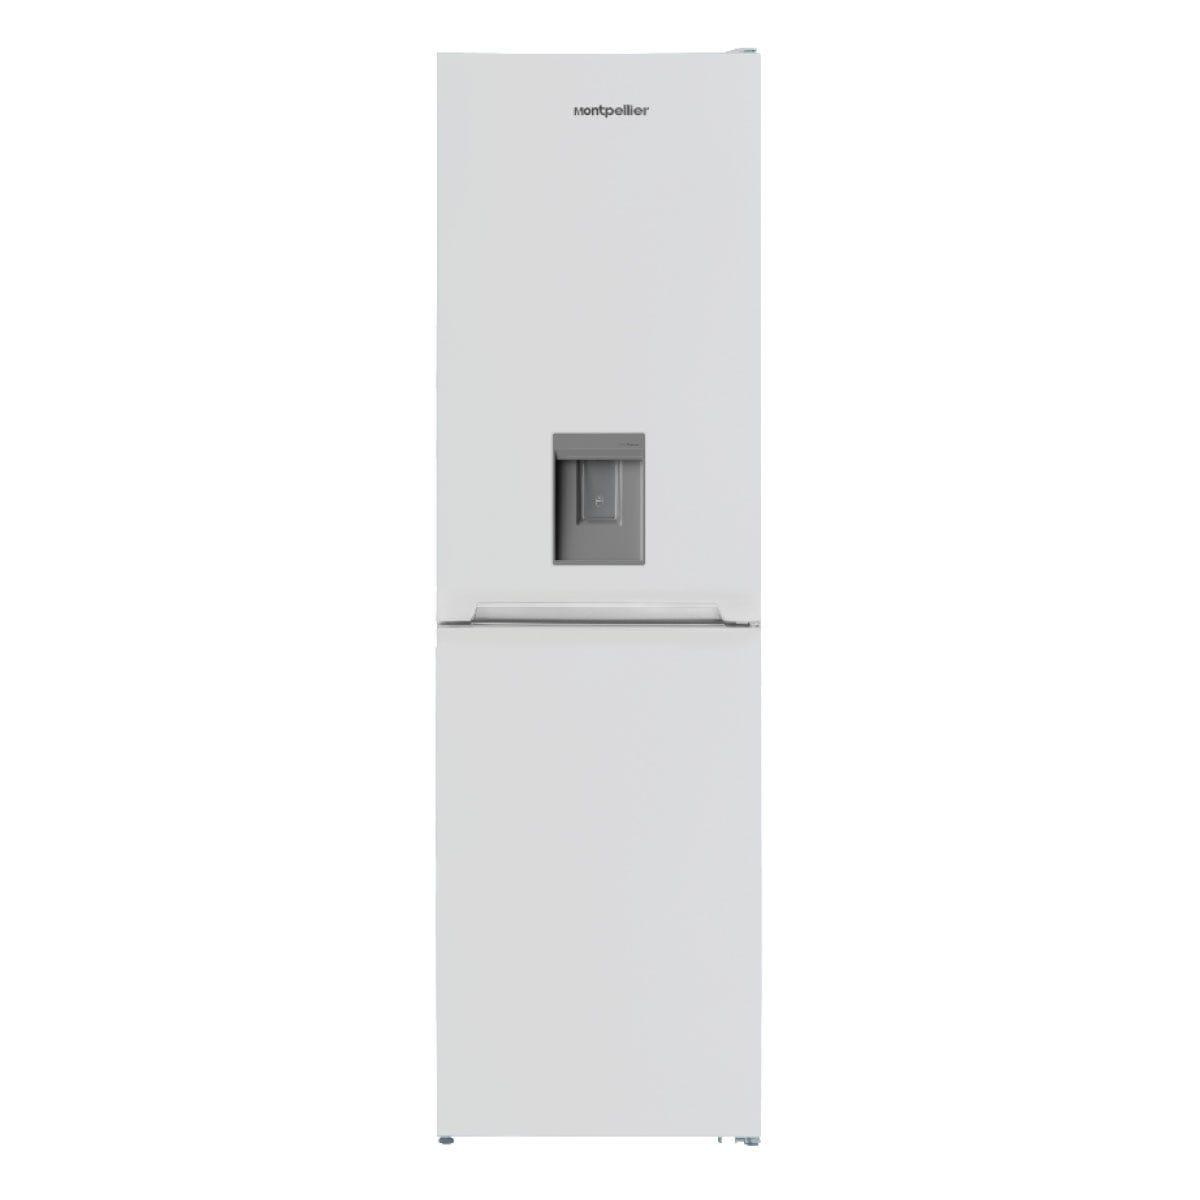 Montpellier MFF185DW 55cm 50/50 Frost Free Fridge Freezer with Water Dispenser - White